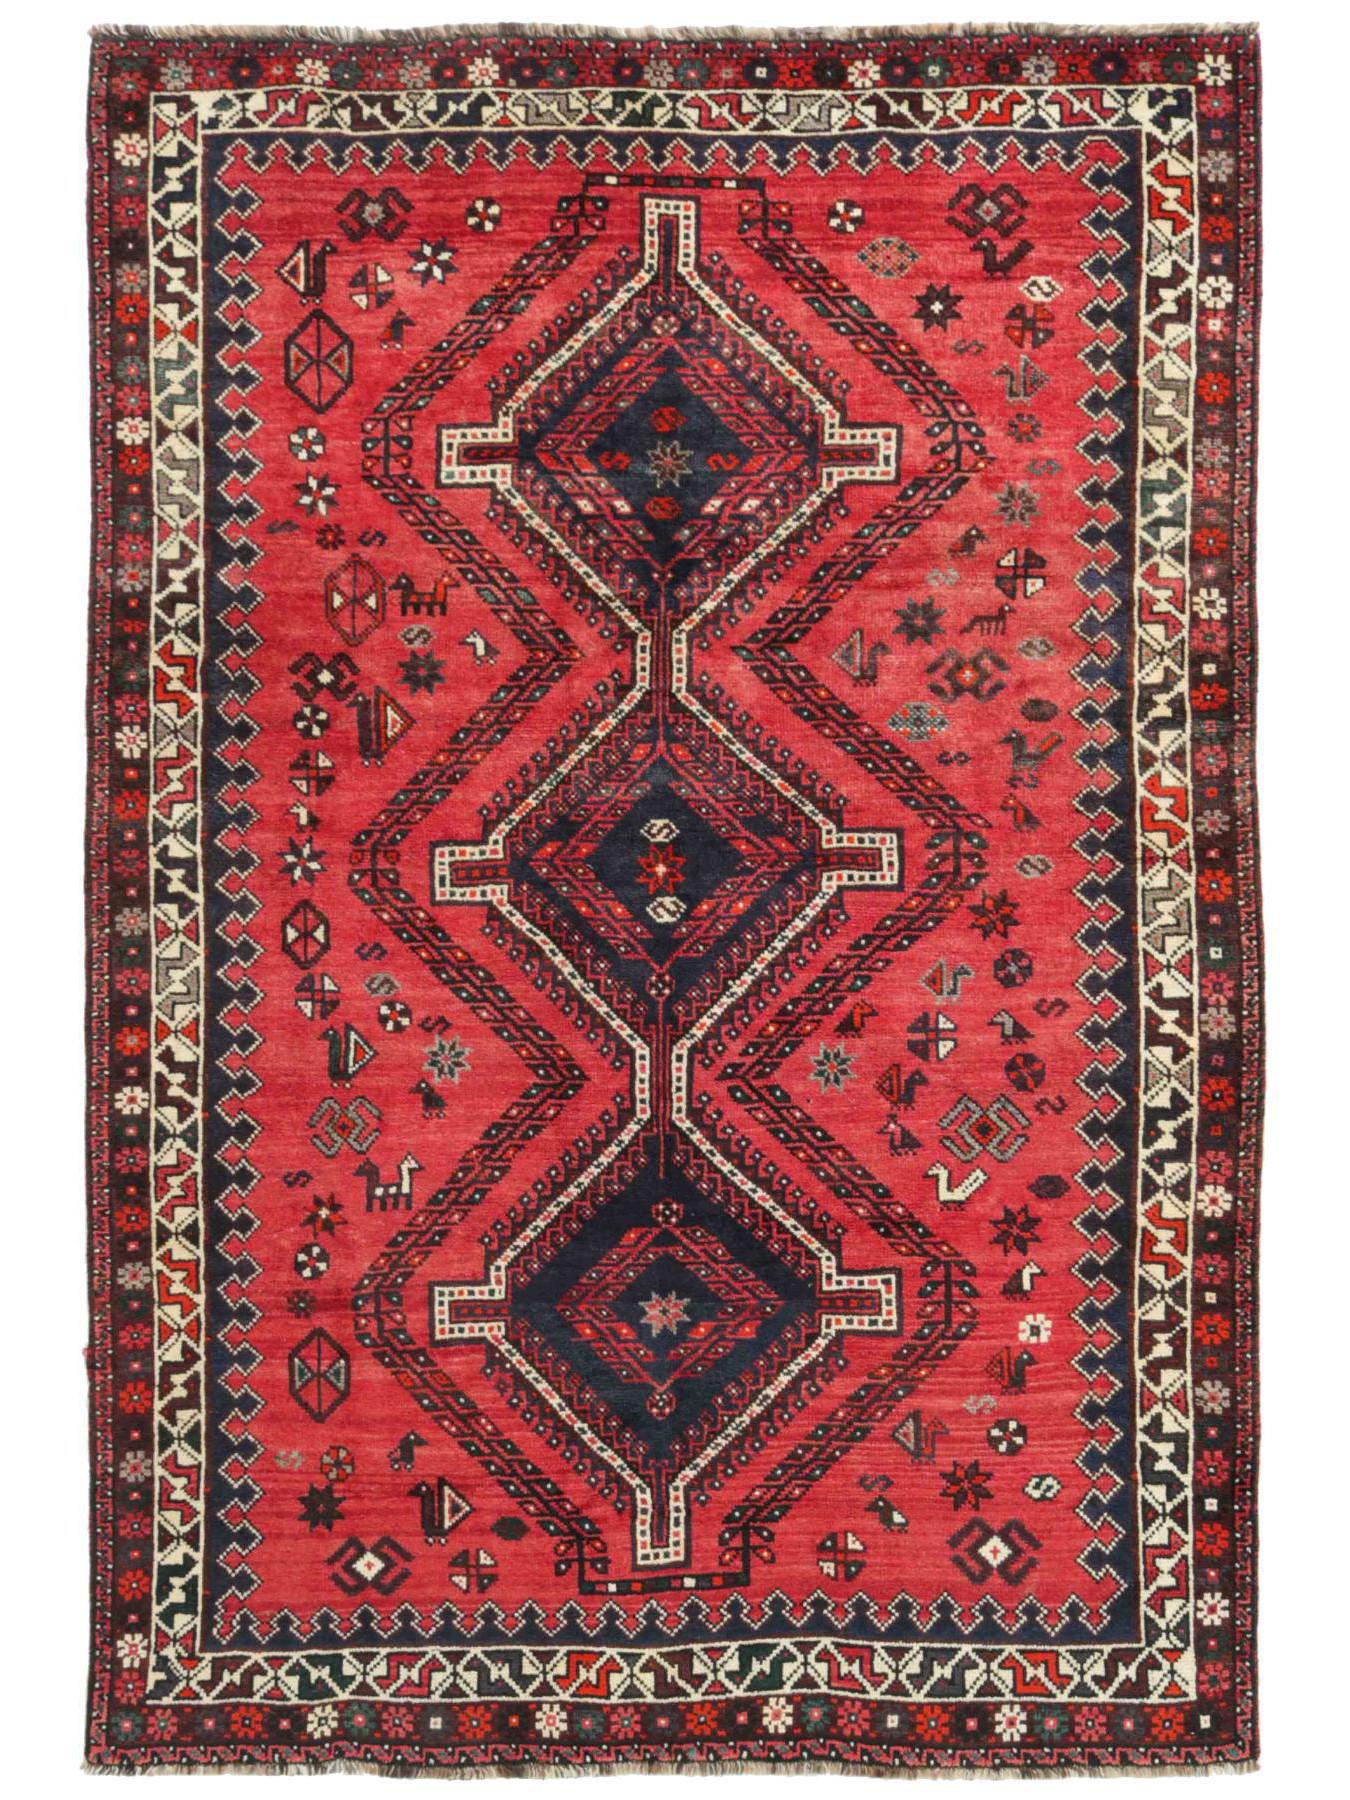 Tapis persans - Shiraz